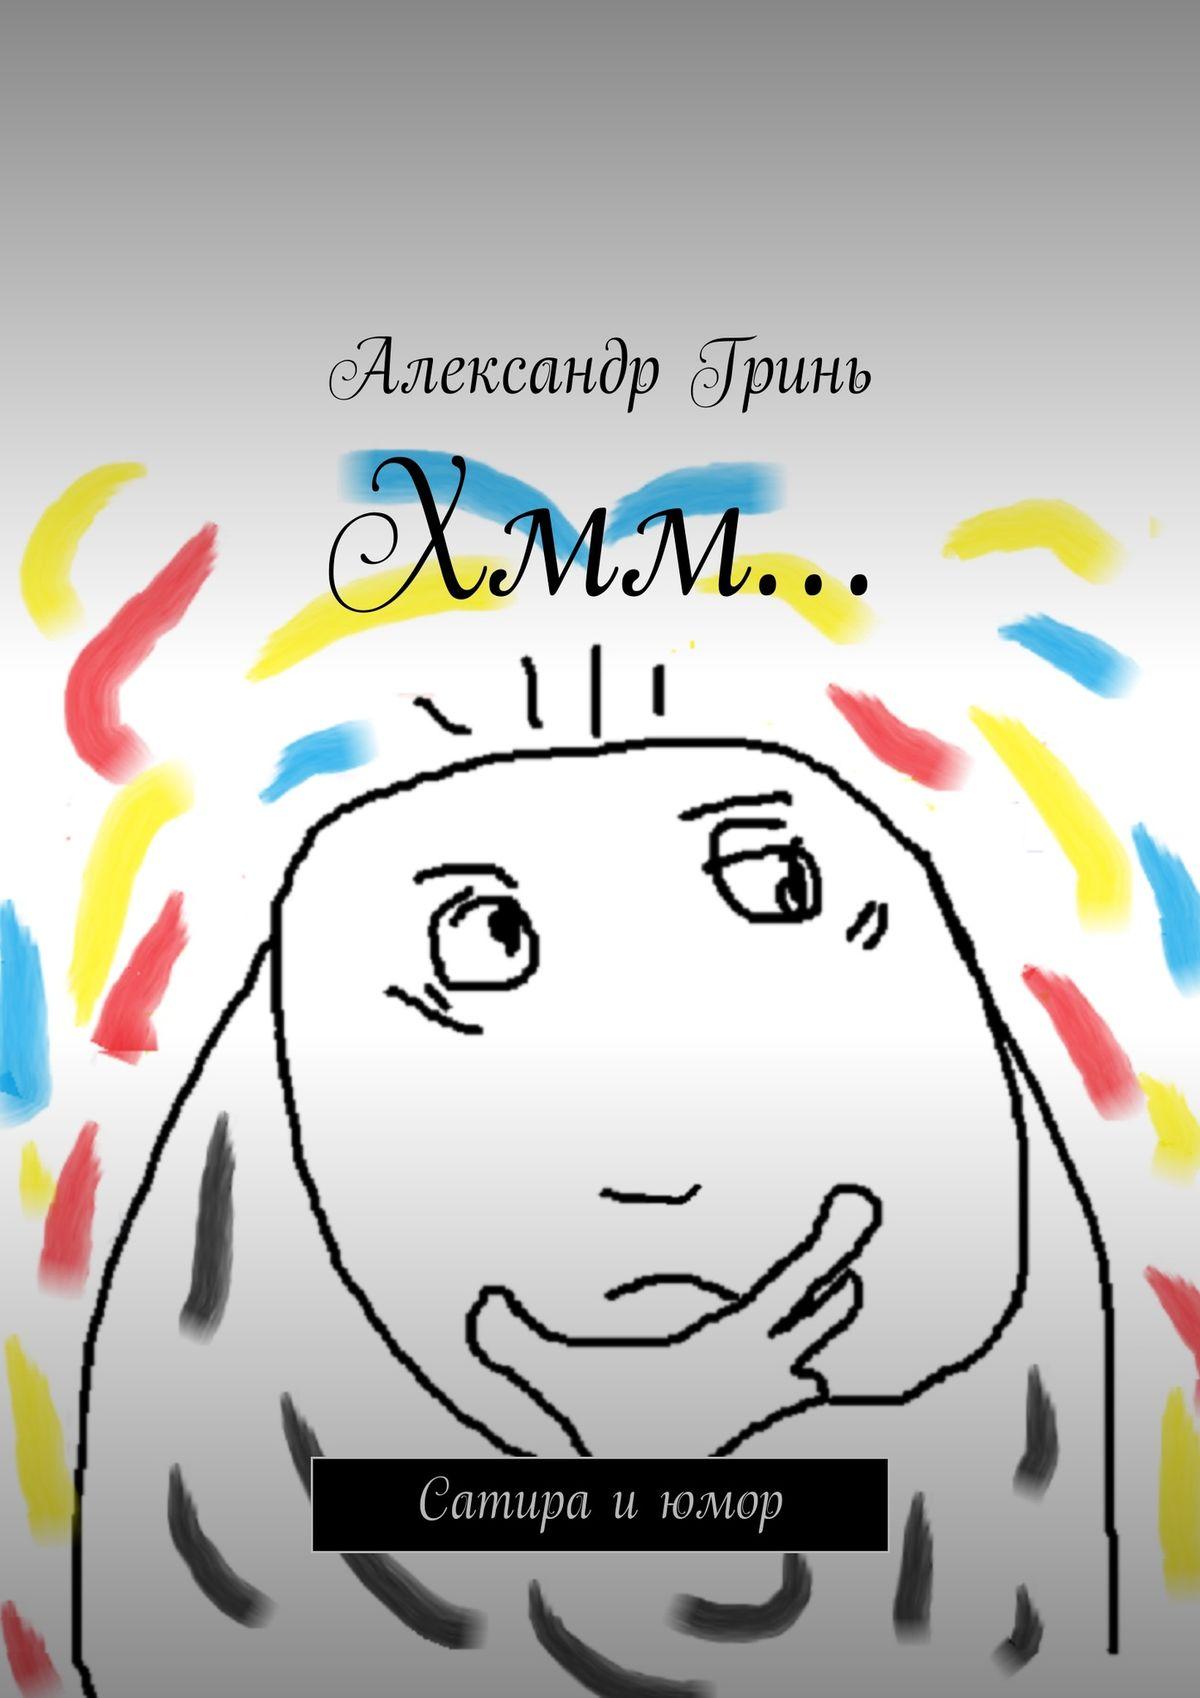 Александр Гринь Хмм… Сатира июмор с михалков сатира и юмор